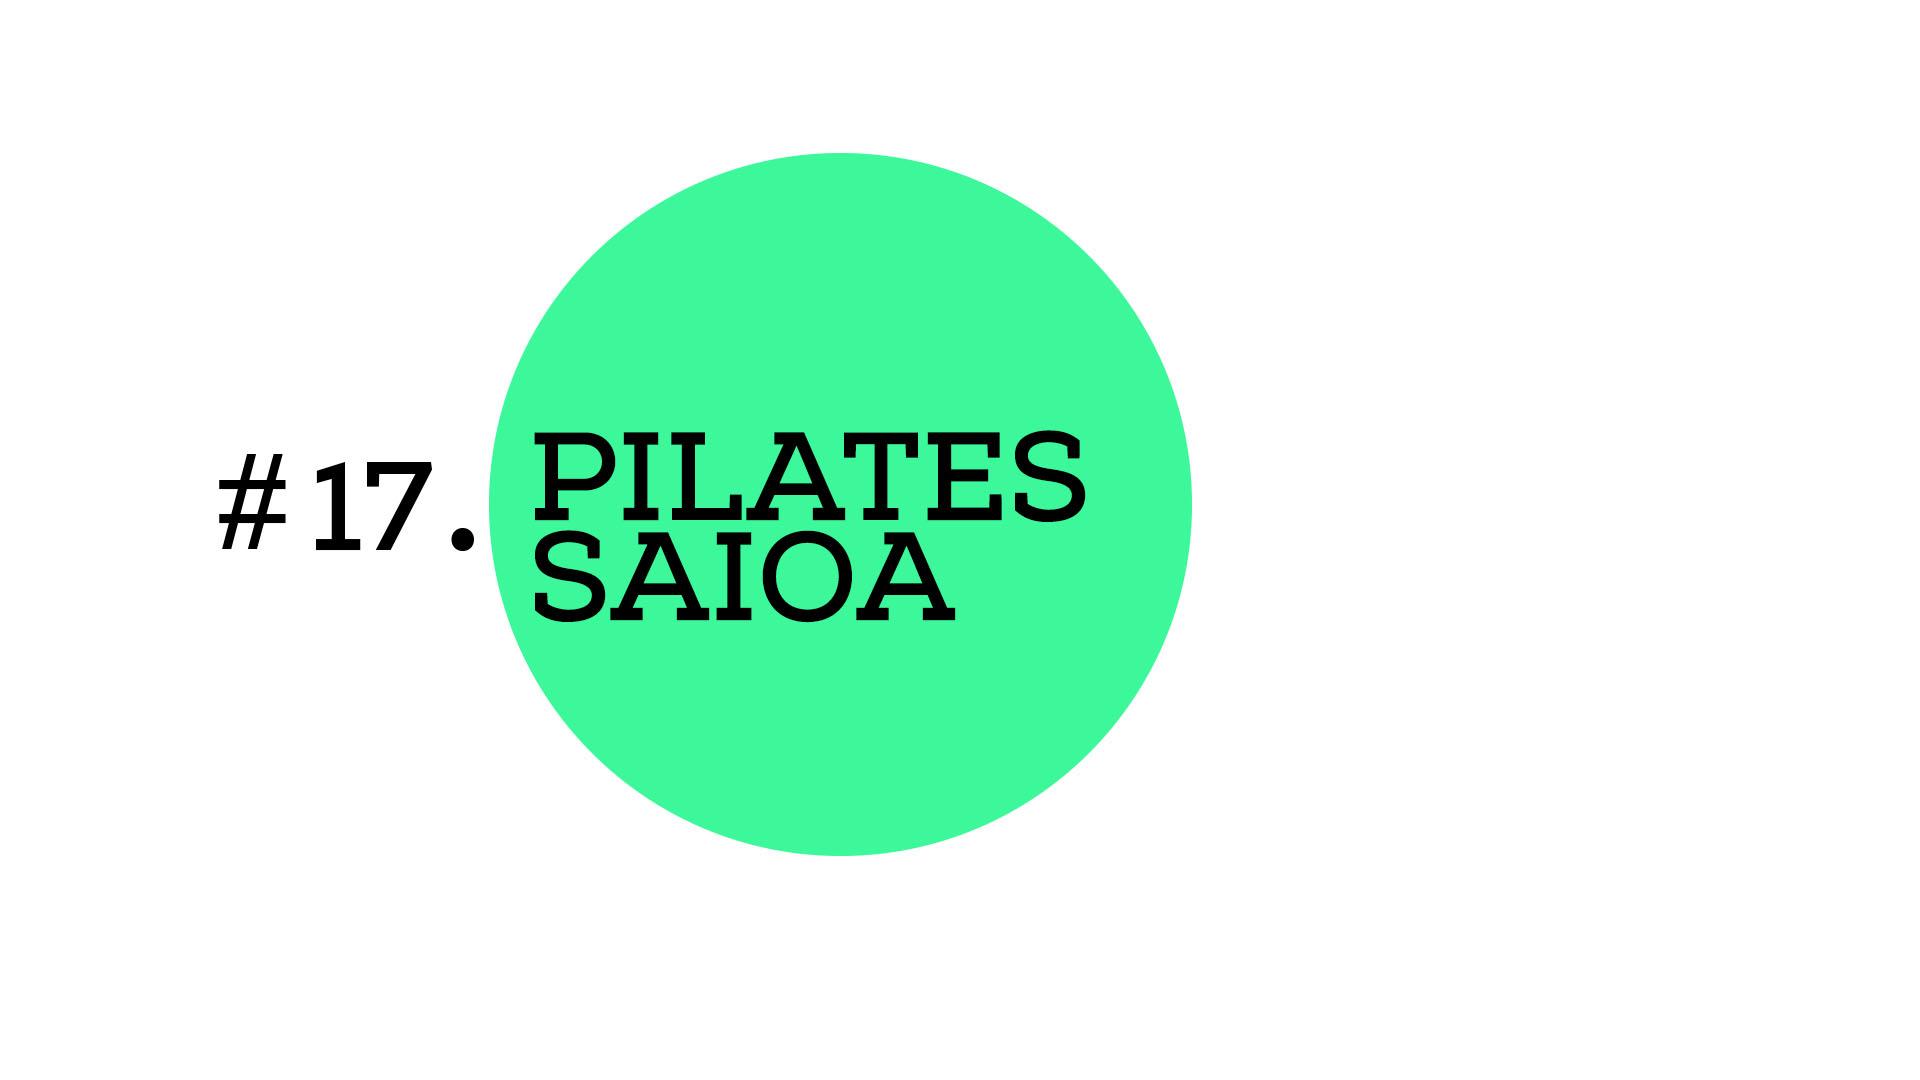 Pilates-saioa (A1E17)